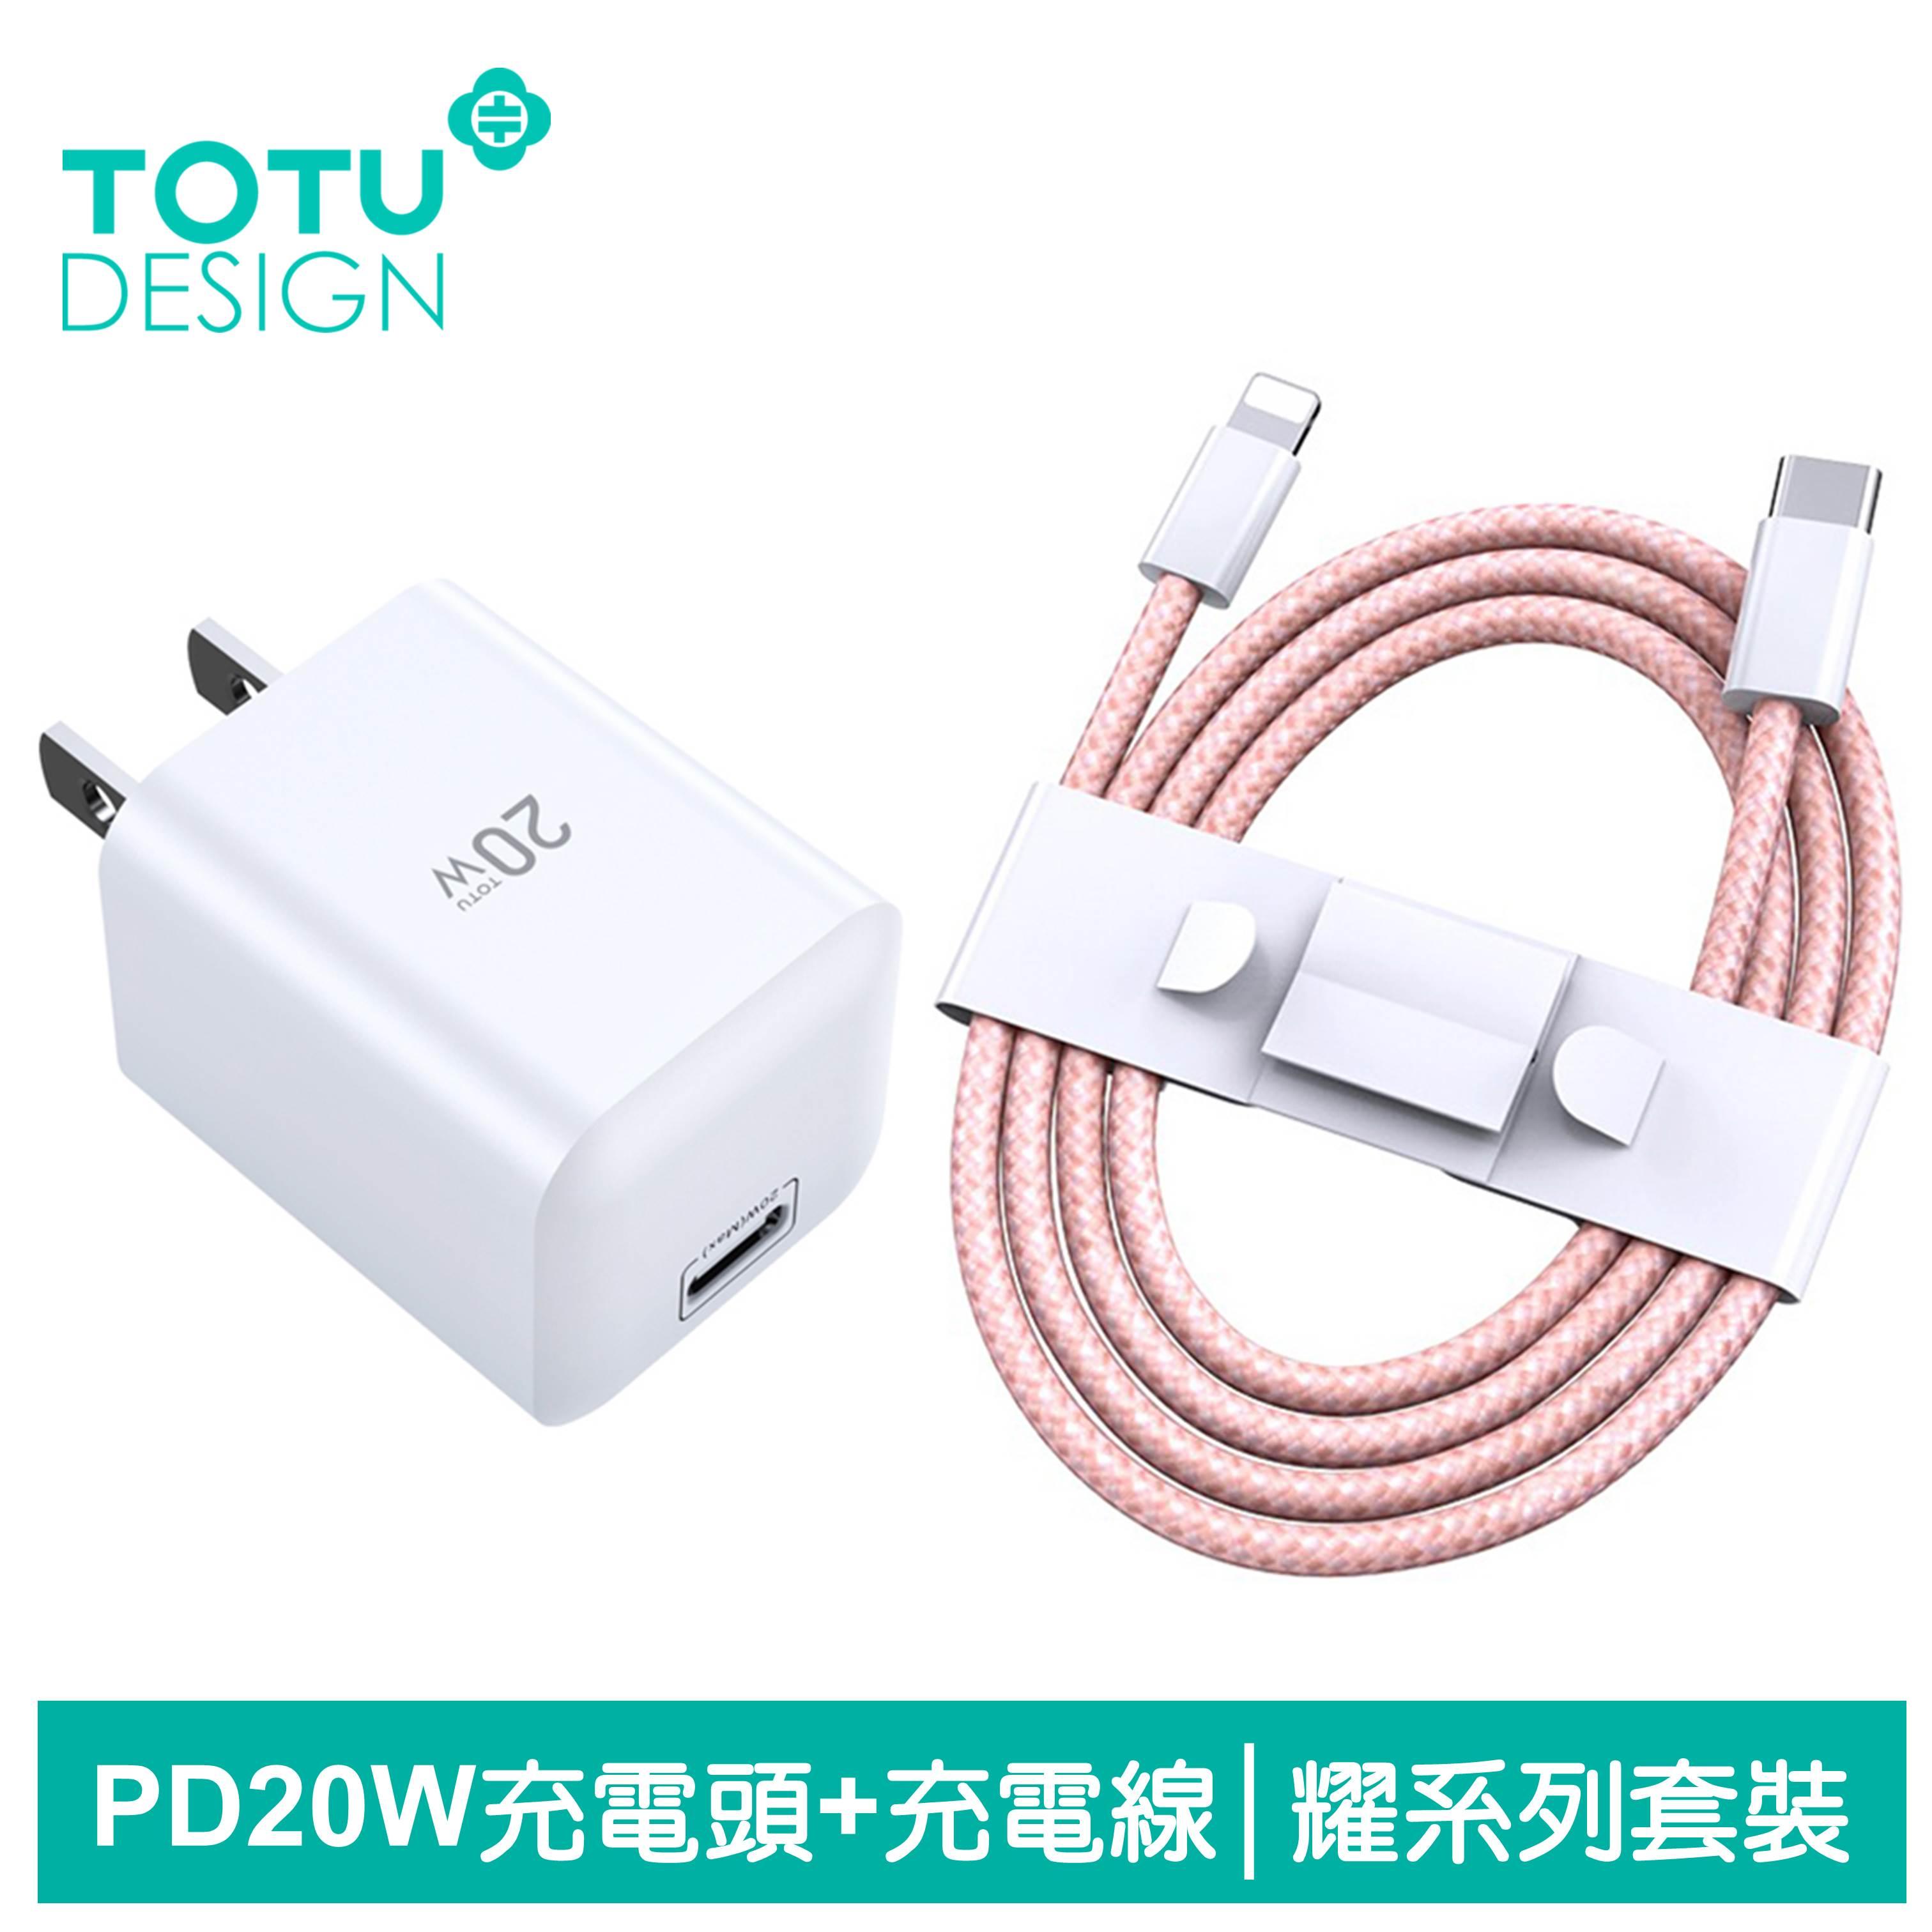 TOTU台灣官方 PD/iPhone充電線充電器充電頭傳輸線快充線快充頭 20W 耀彩套裝 白色頭+粉色線